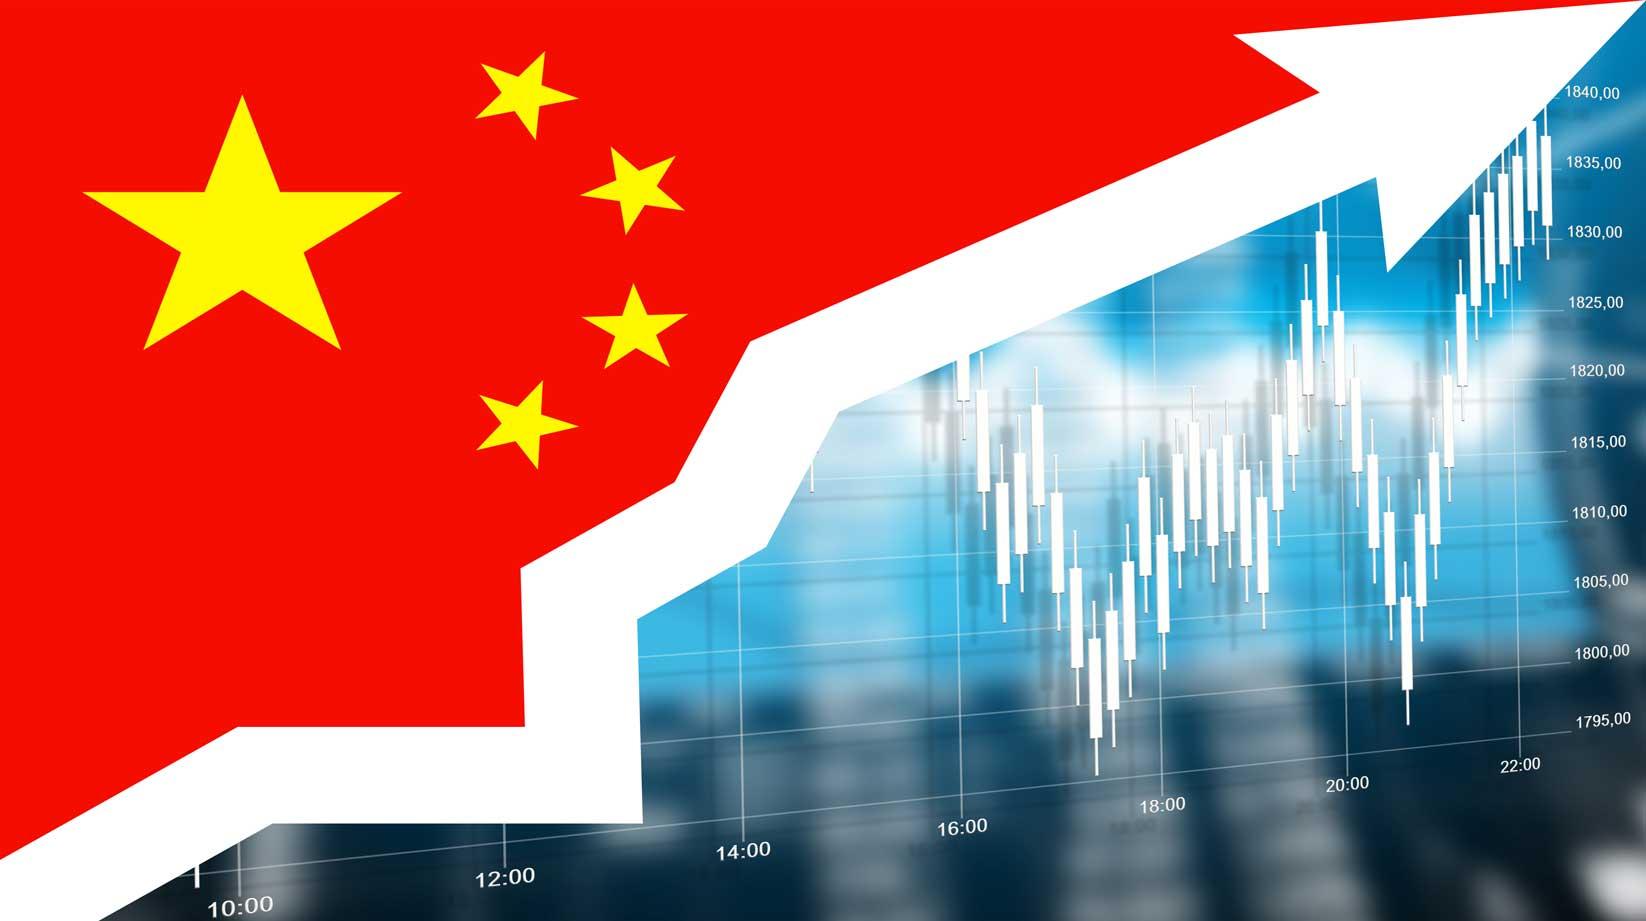 Dow Jones Futures Five Key Takeaways From Todays Stock Market